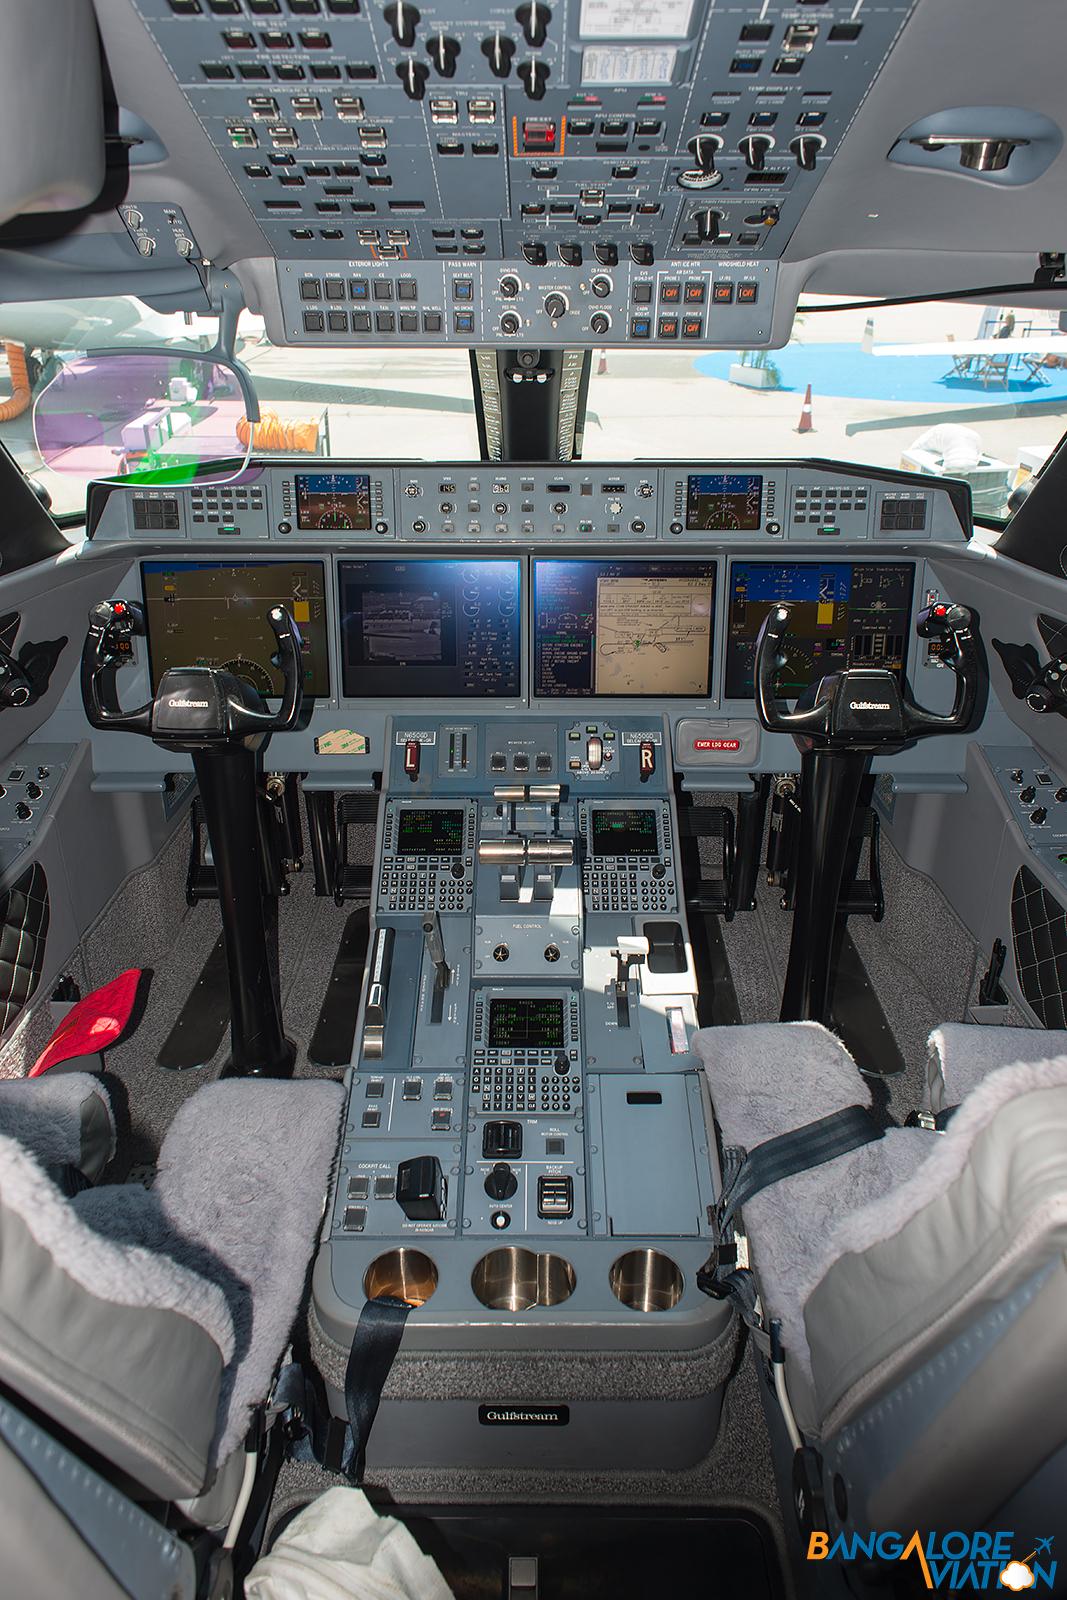 Through the lens Onboard the UberLuxurious Gulfstream G650